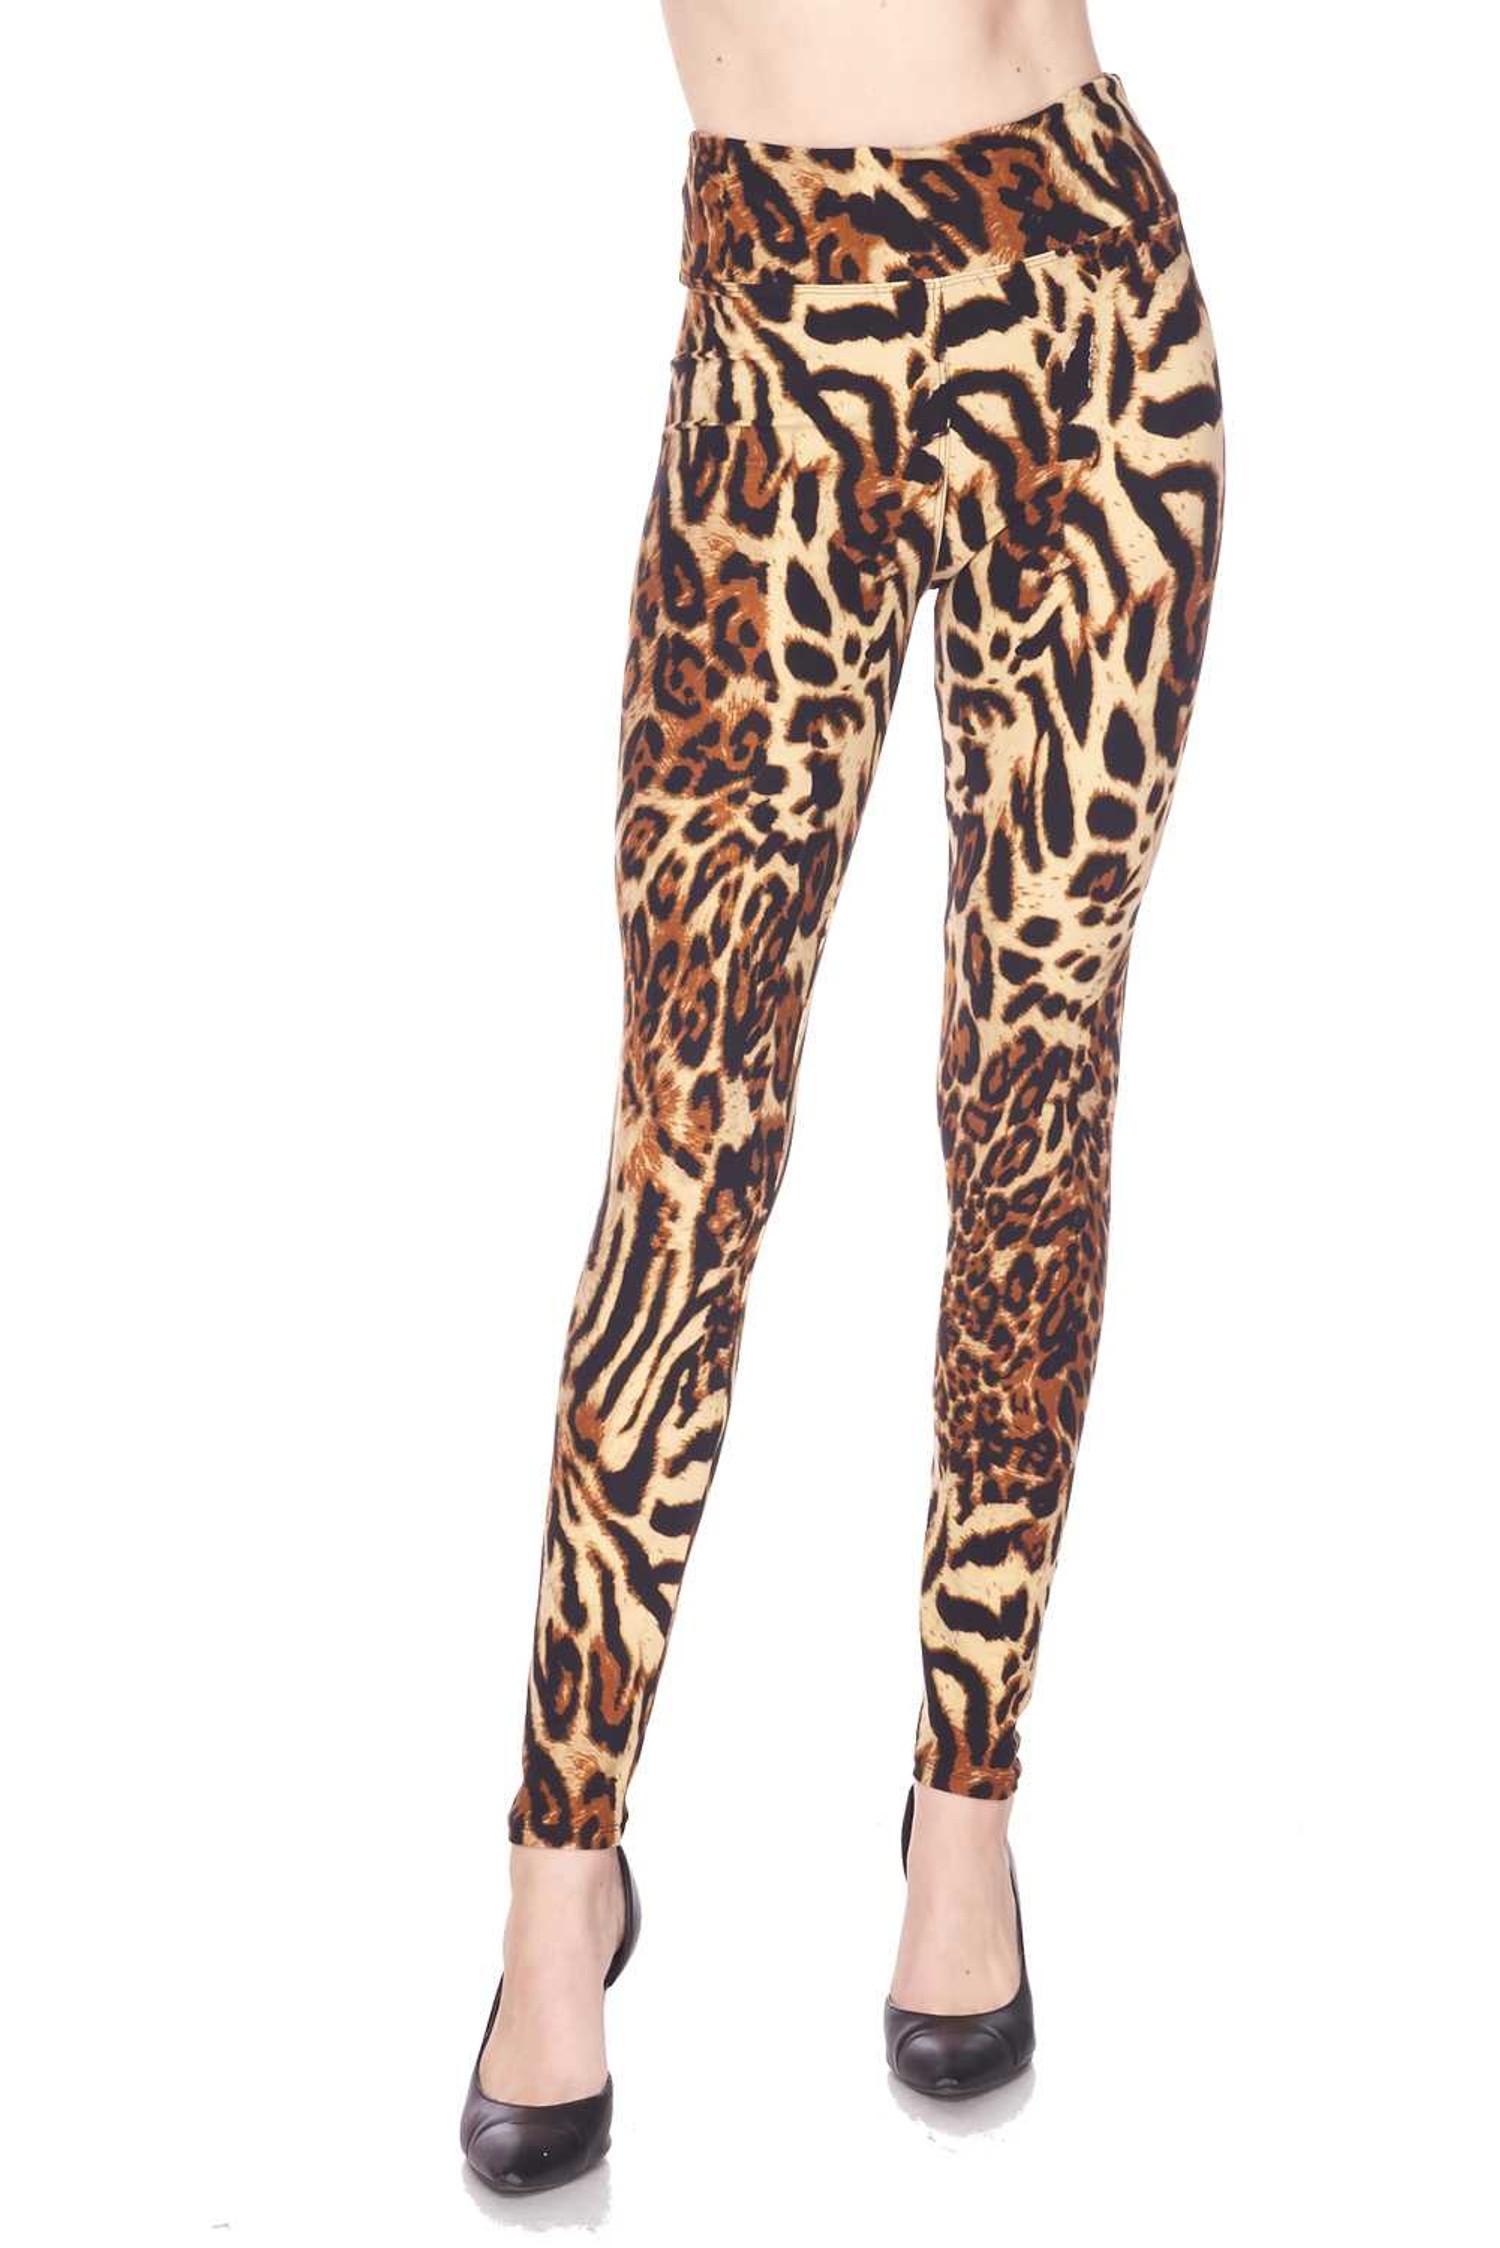 Brushed  Predator Leopard High Waisted Leggings